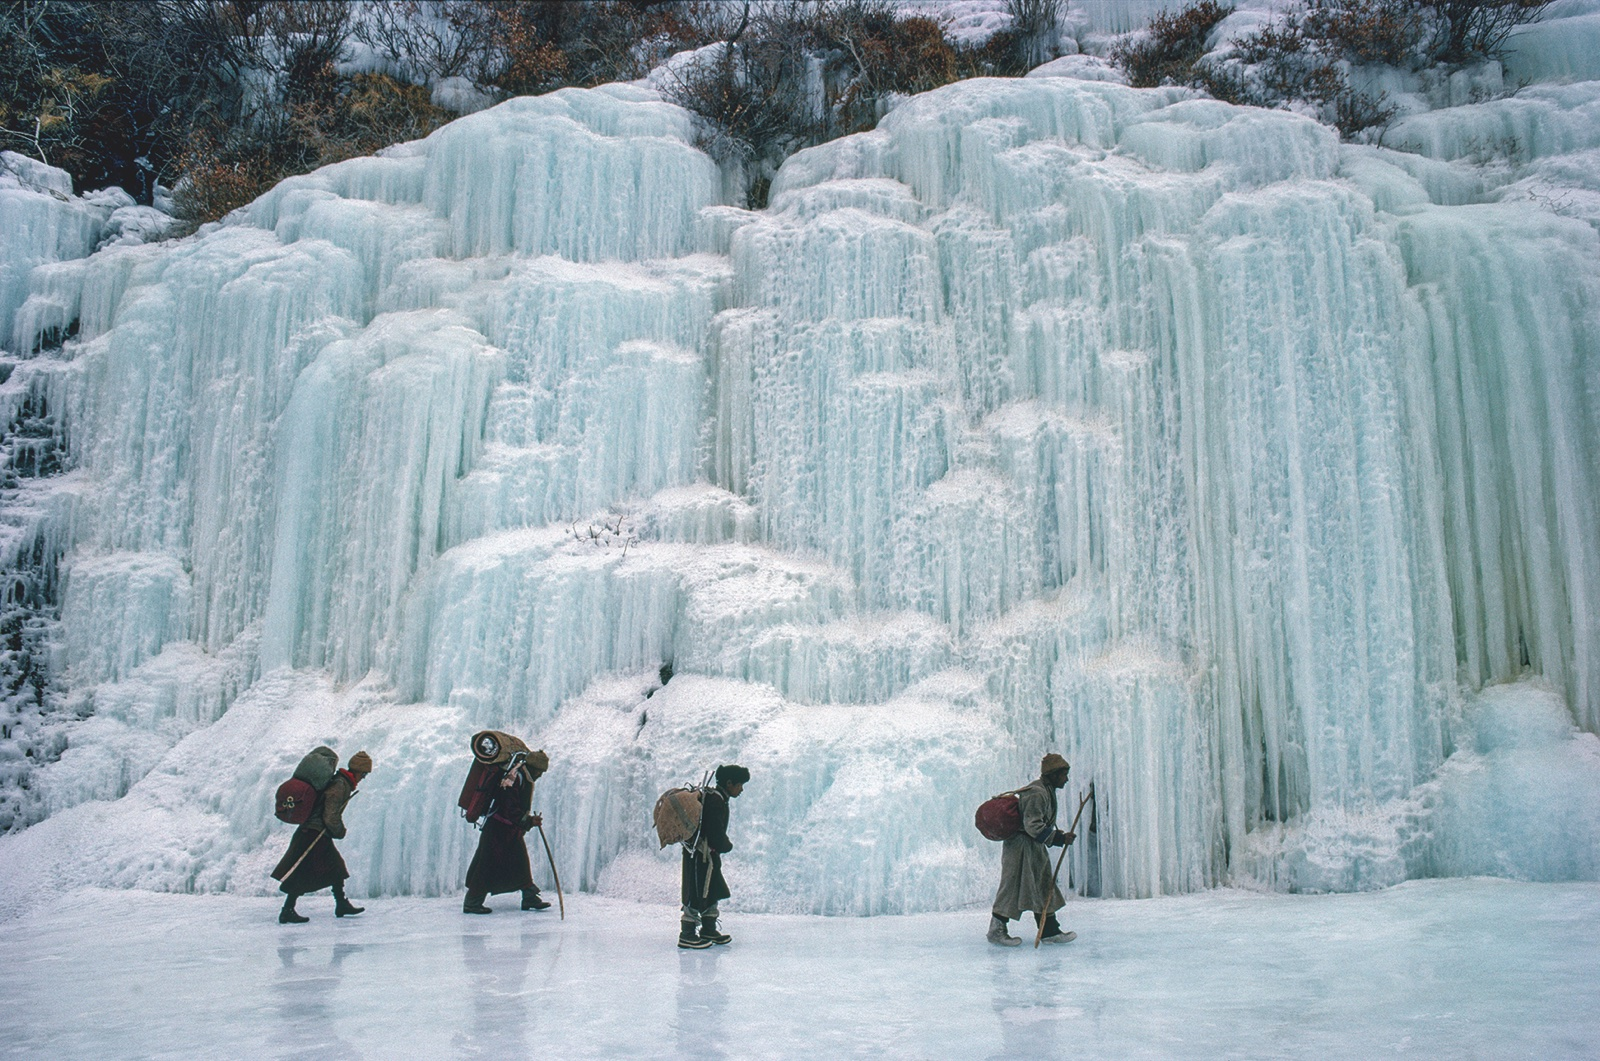 foto:© 2018 Olivier Föllmi. boeddisten bij bevroren waterval